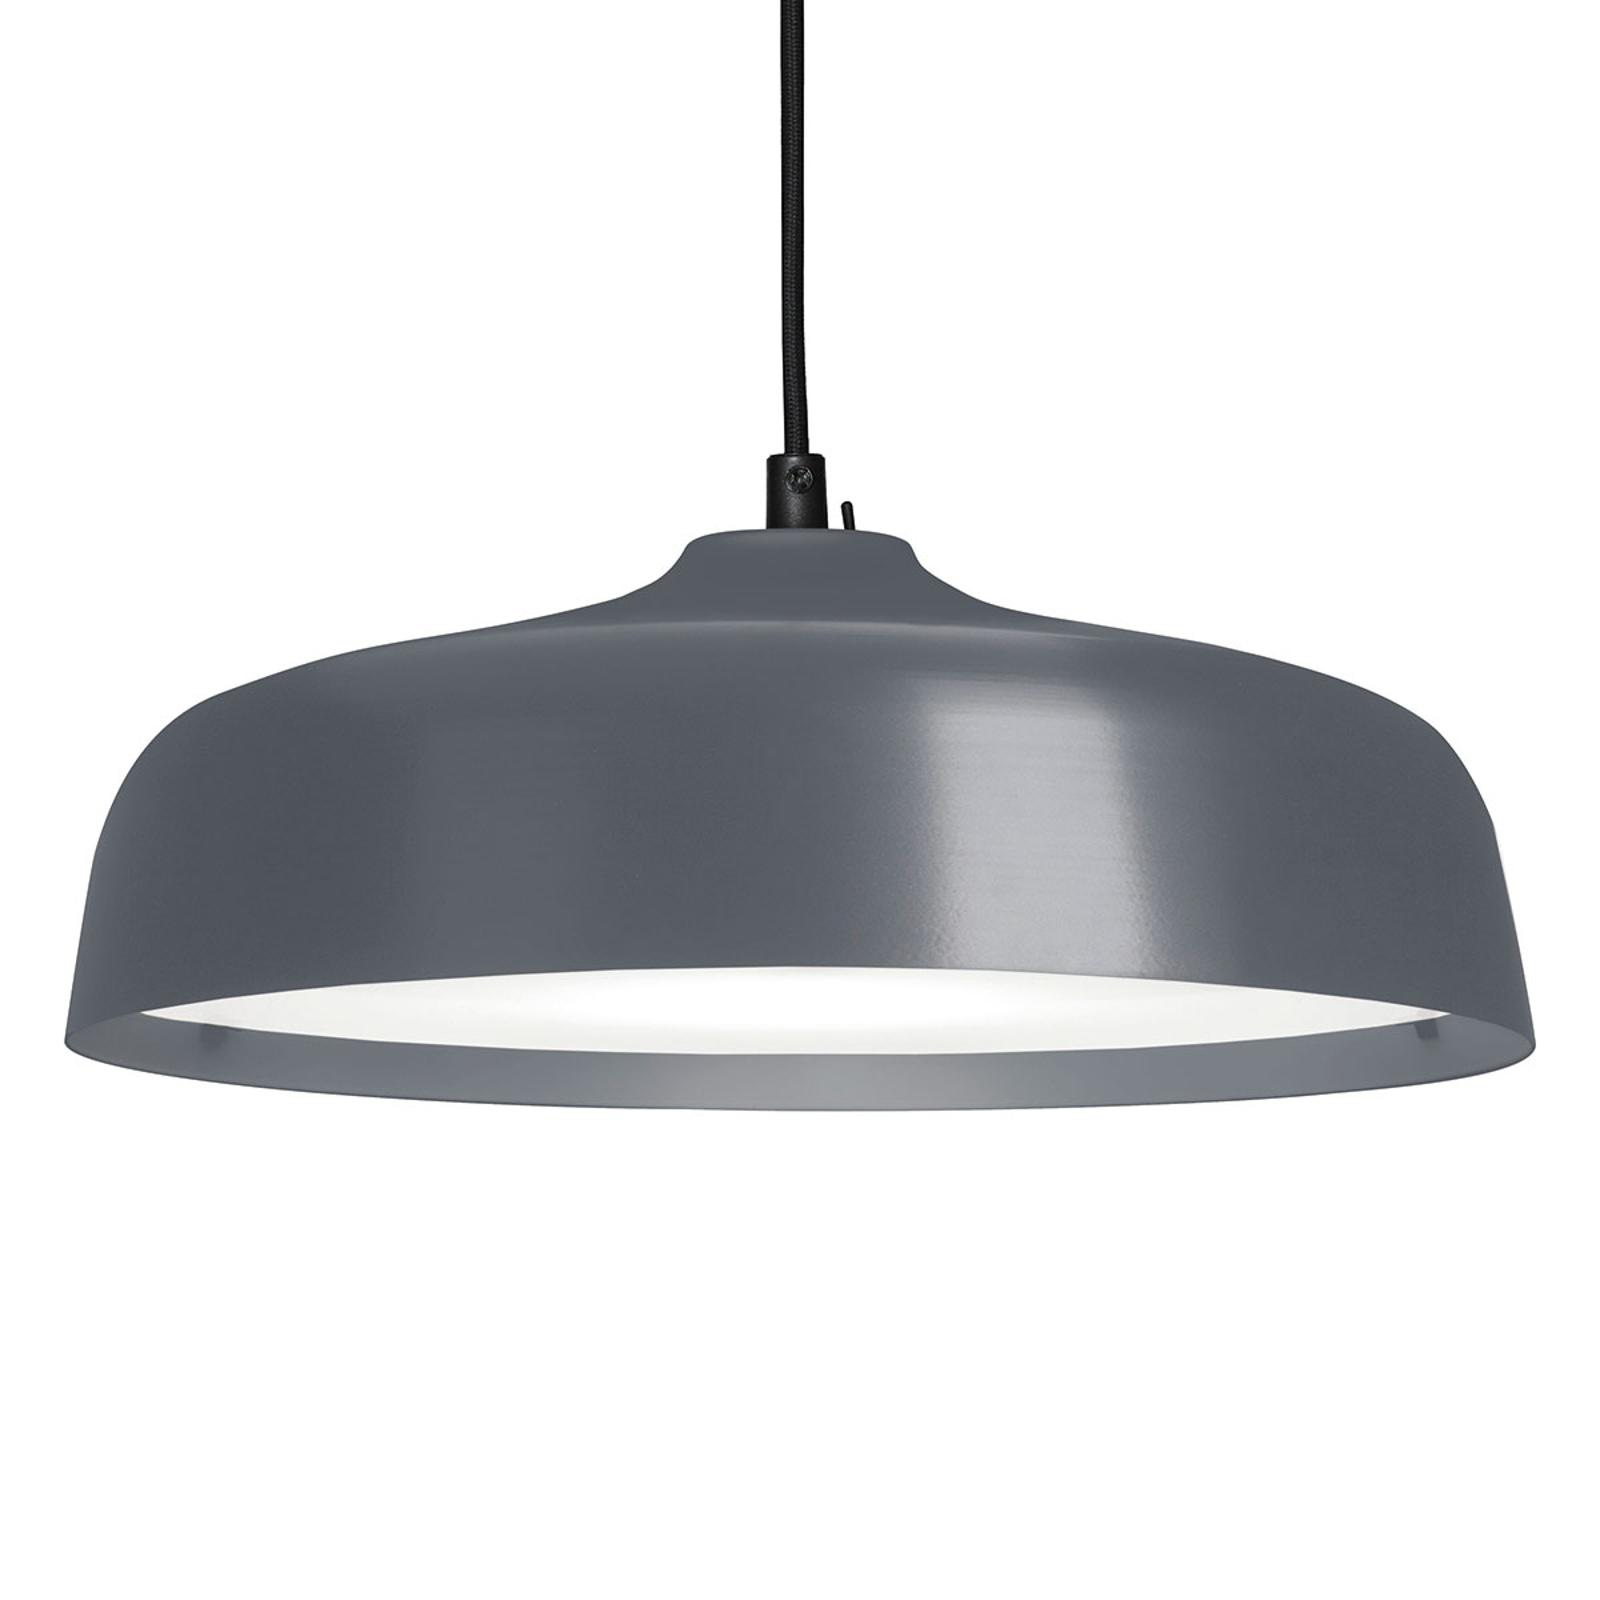 Innolux Candeo Air LED-hængelampe, grafit